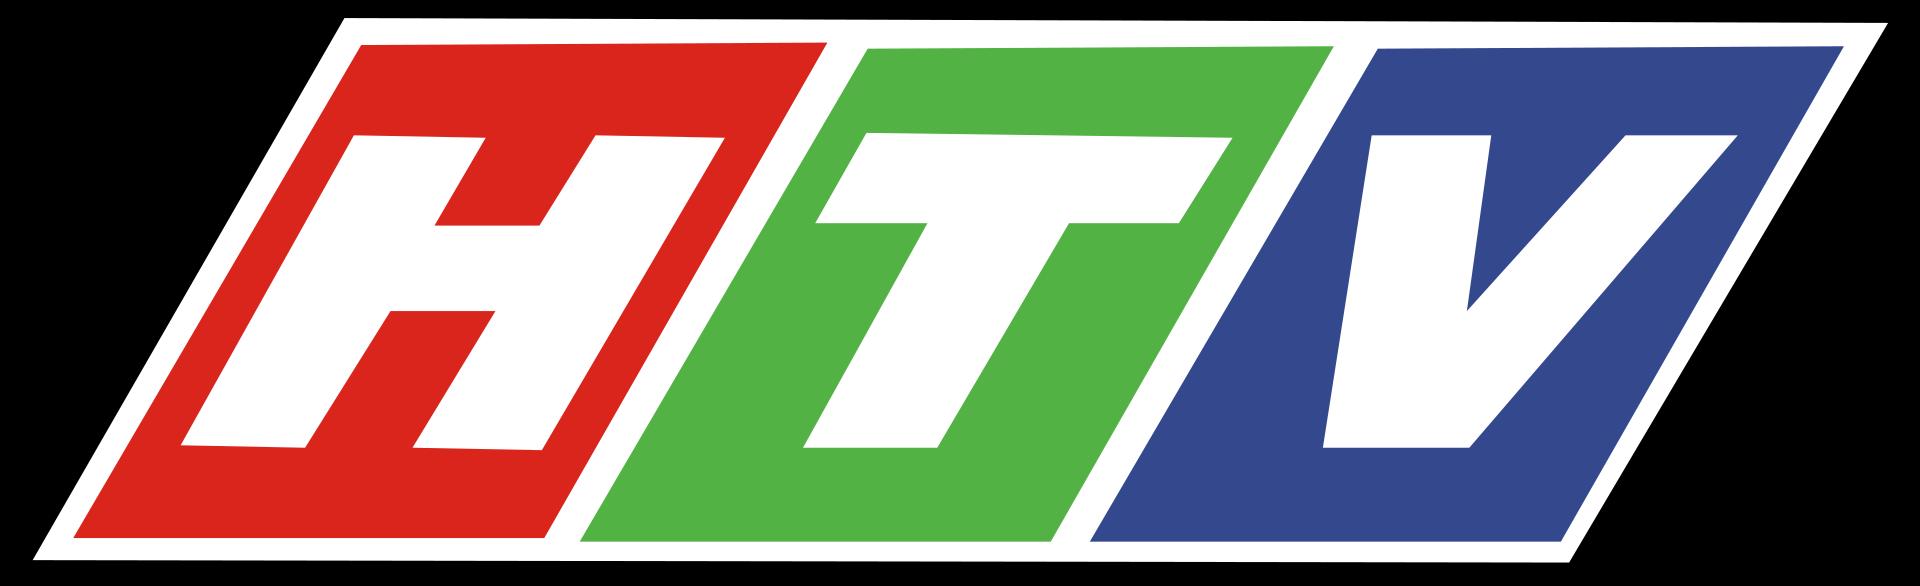 Ho Chi Minh City Television logo (2016-present).png